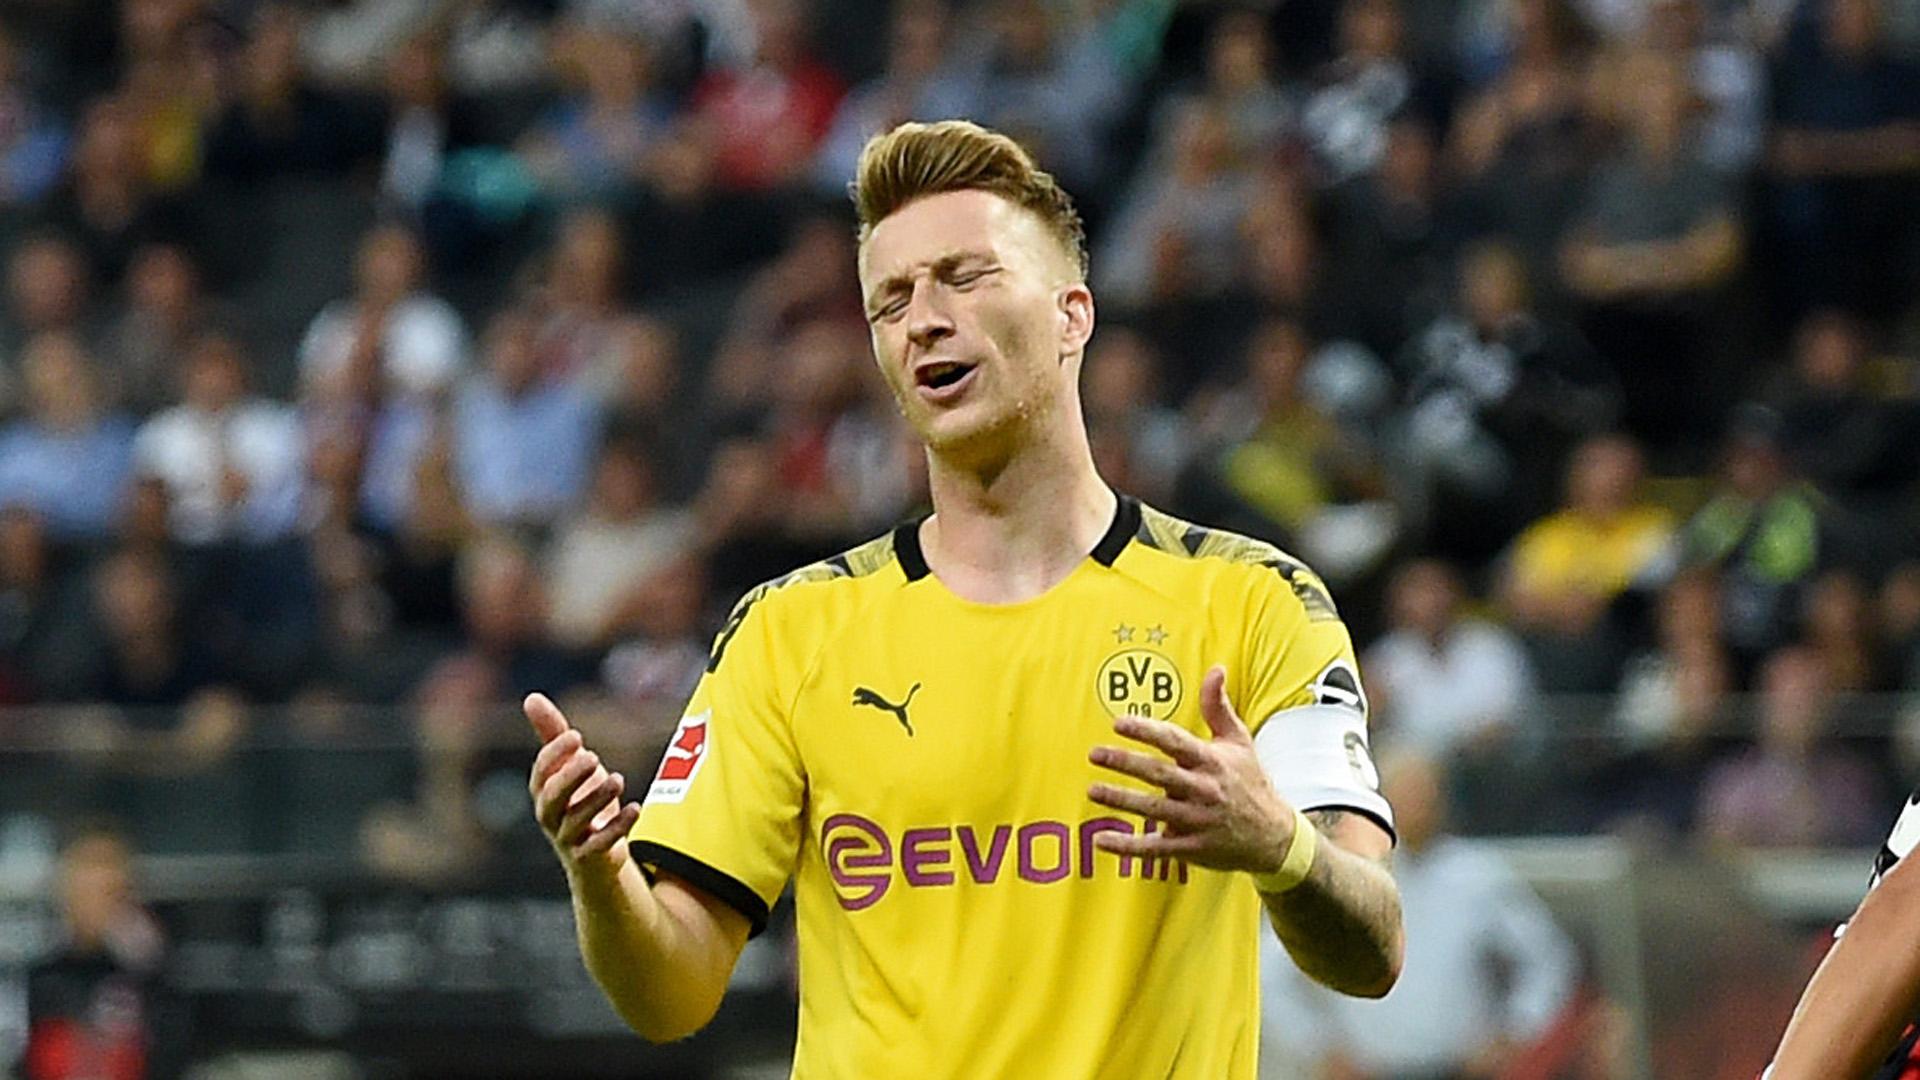 Frankfurt Dortmund 2019 Marco Reus